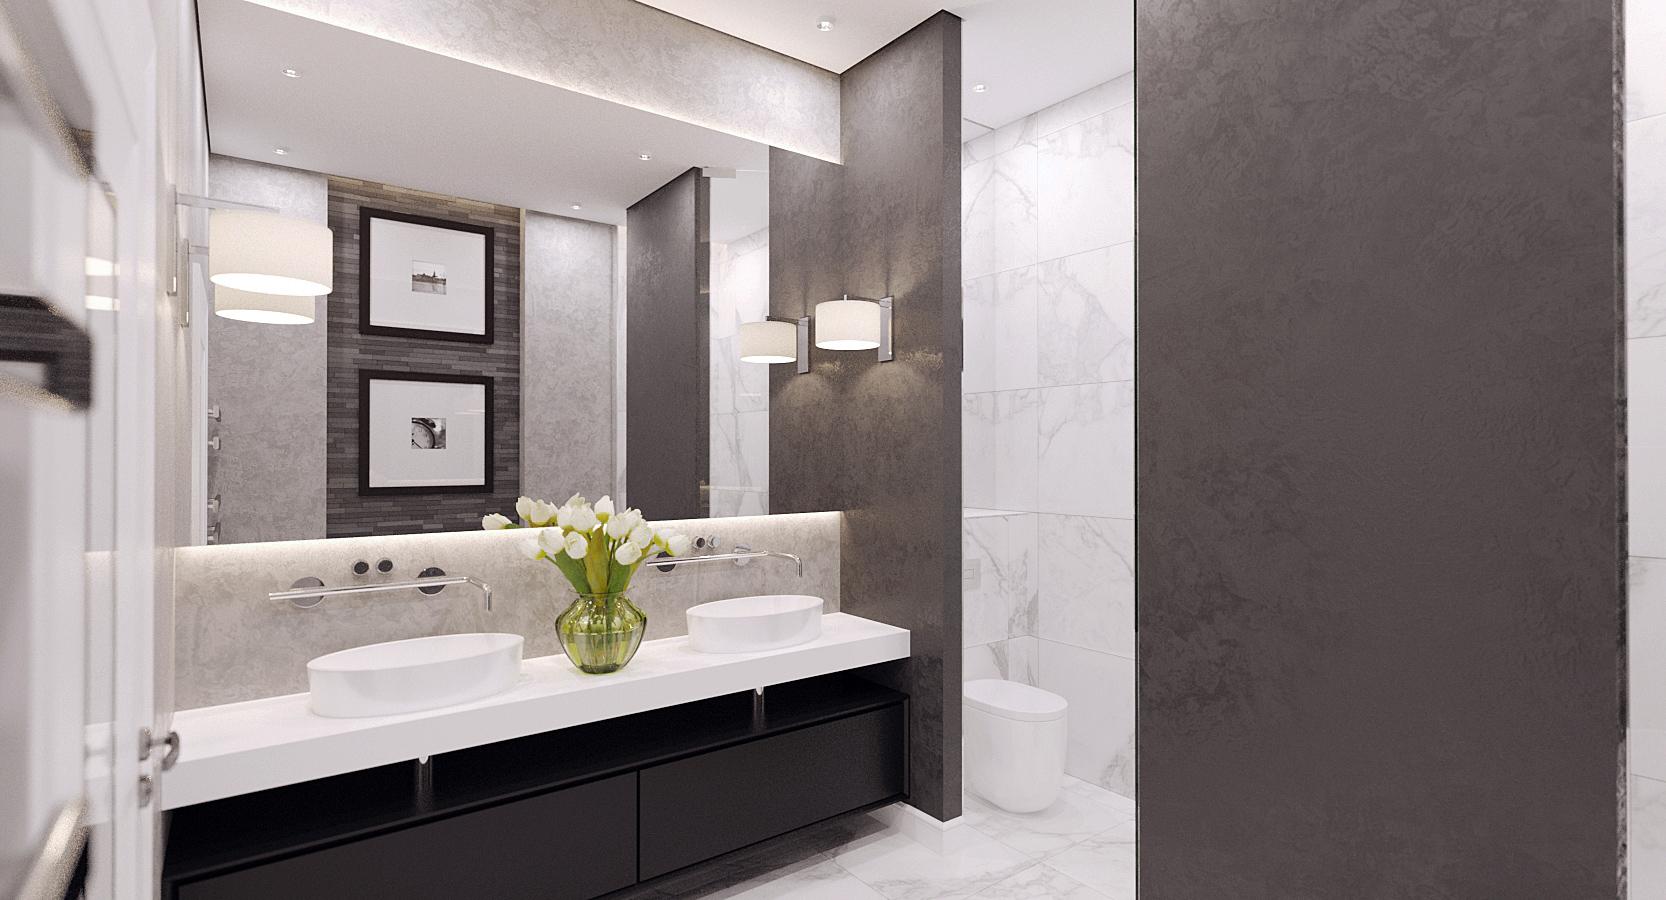 bath_room_v2_1